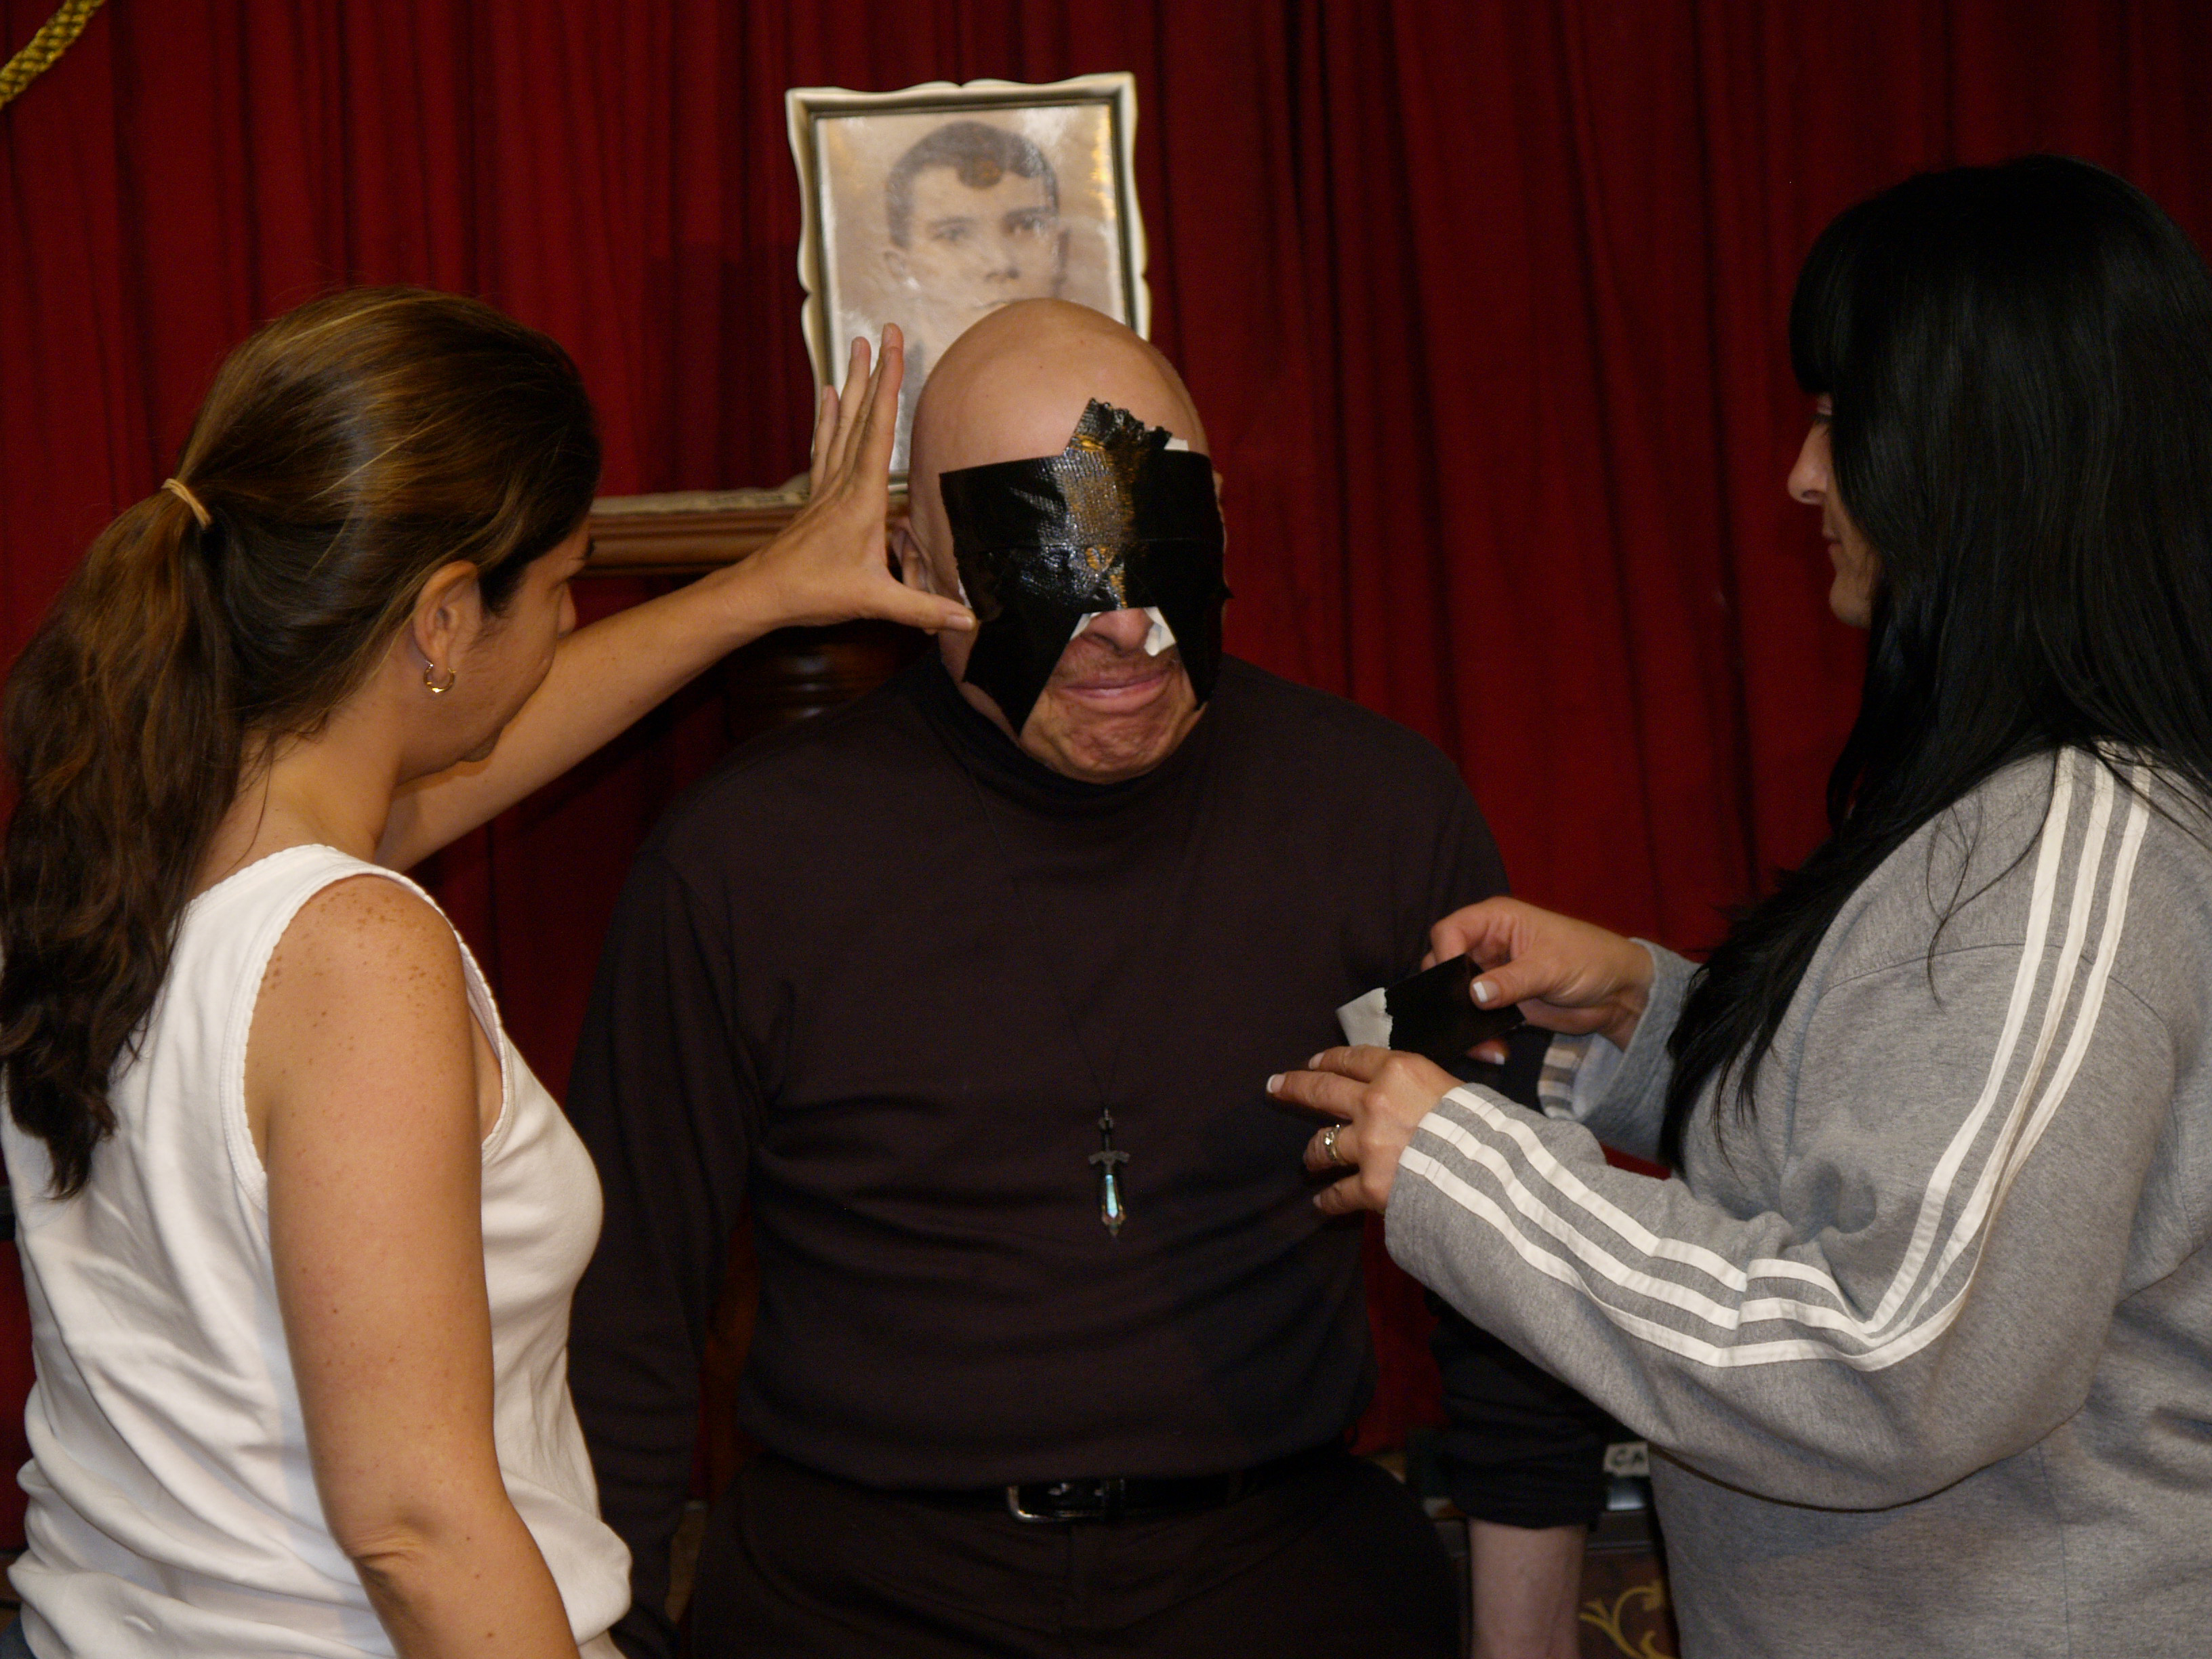 supernormalist paranormalist sightless vision mentalist seance